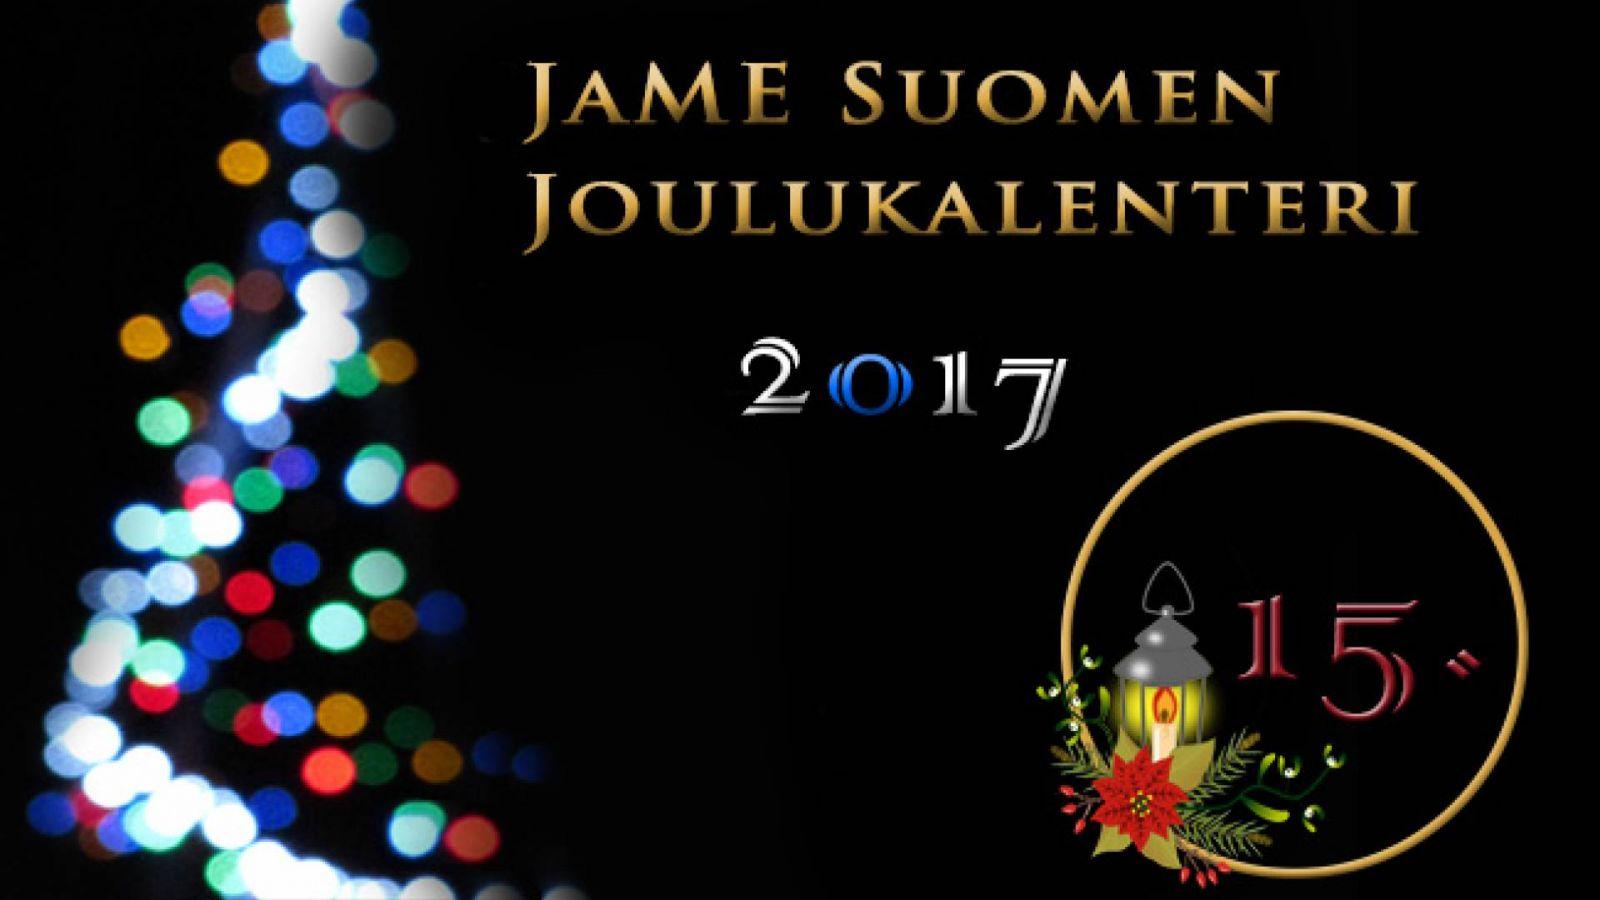 JaME Suomen joulukalenterin 15. luukku © Nipsu